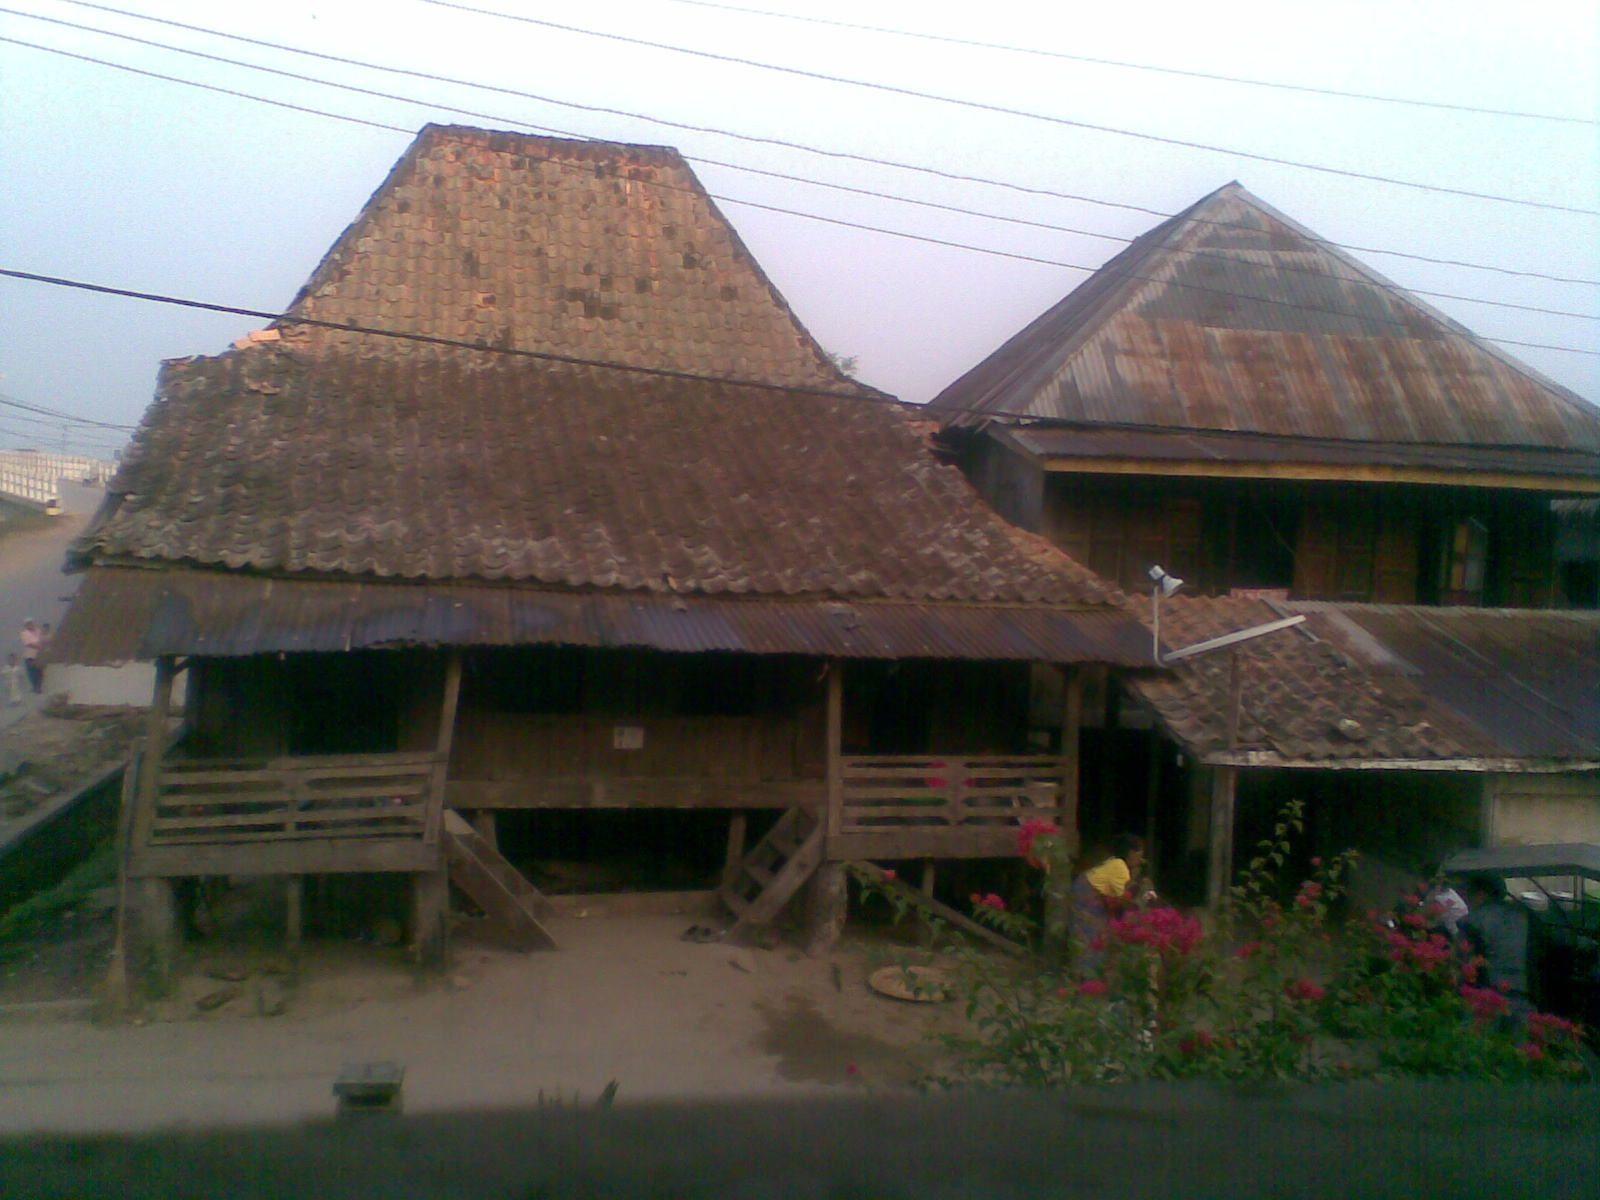 Rumah Limas Palembang Sumatera Selatan Indonesia Pinterest Kota